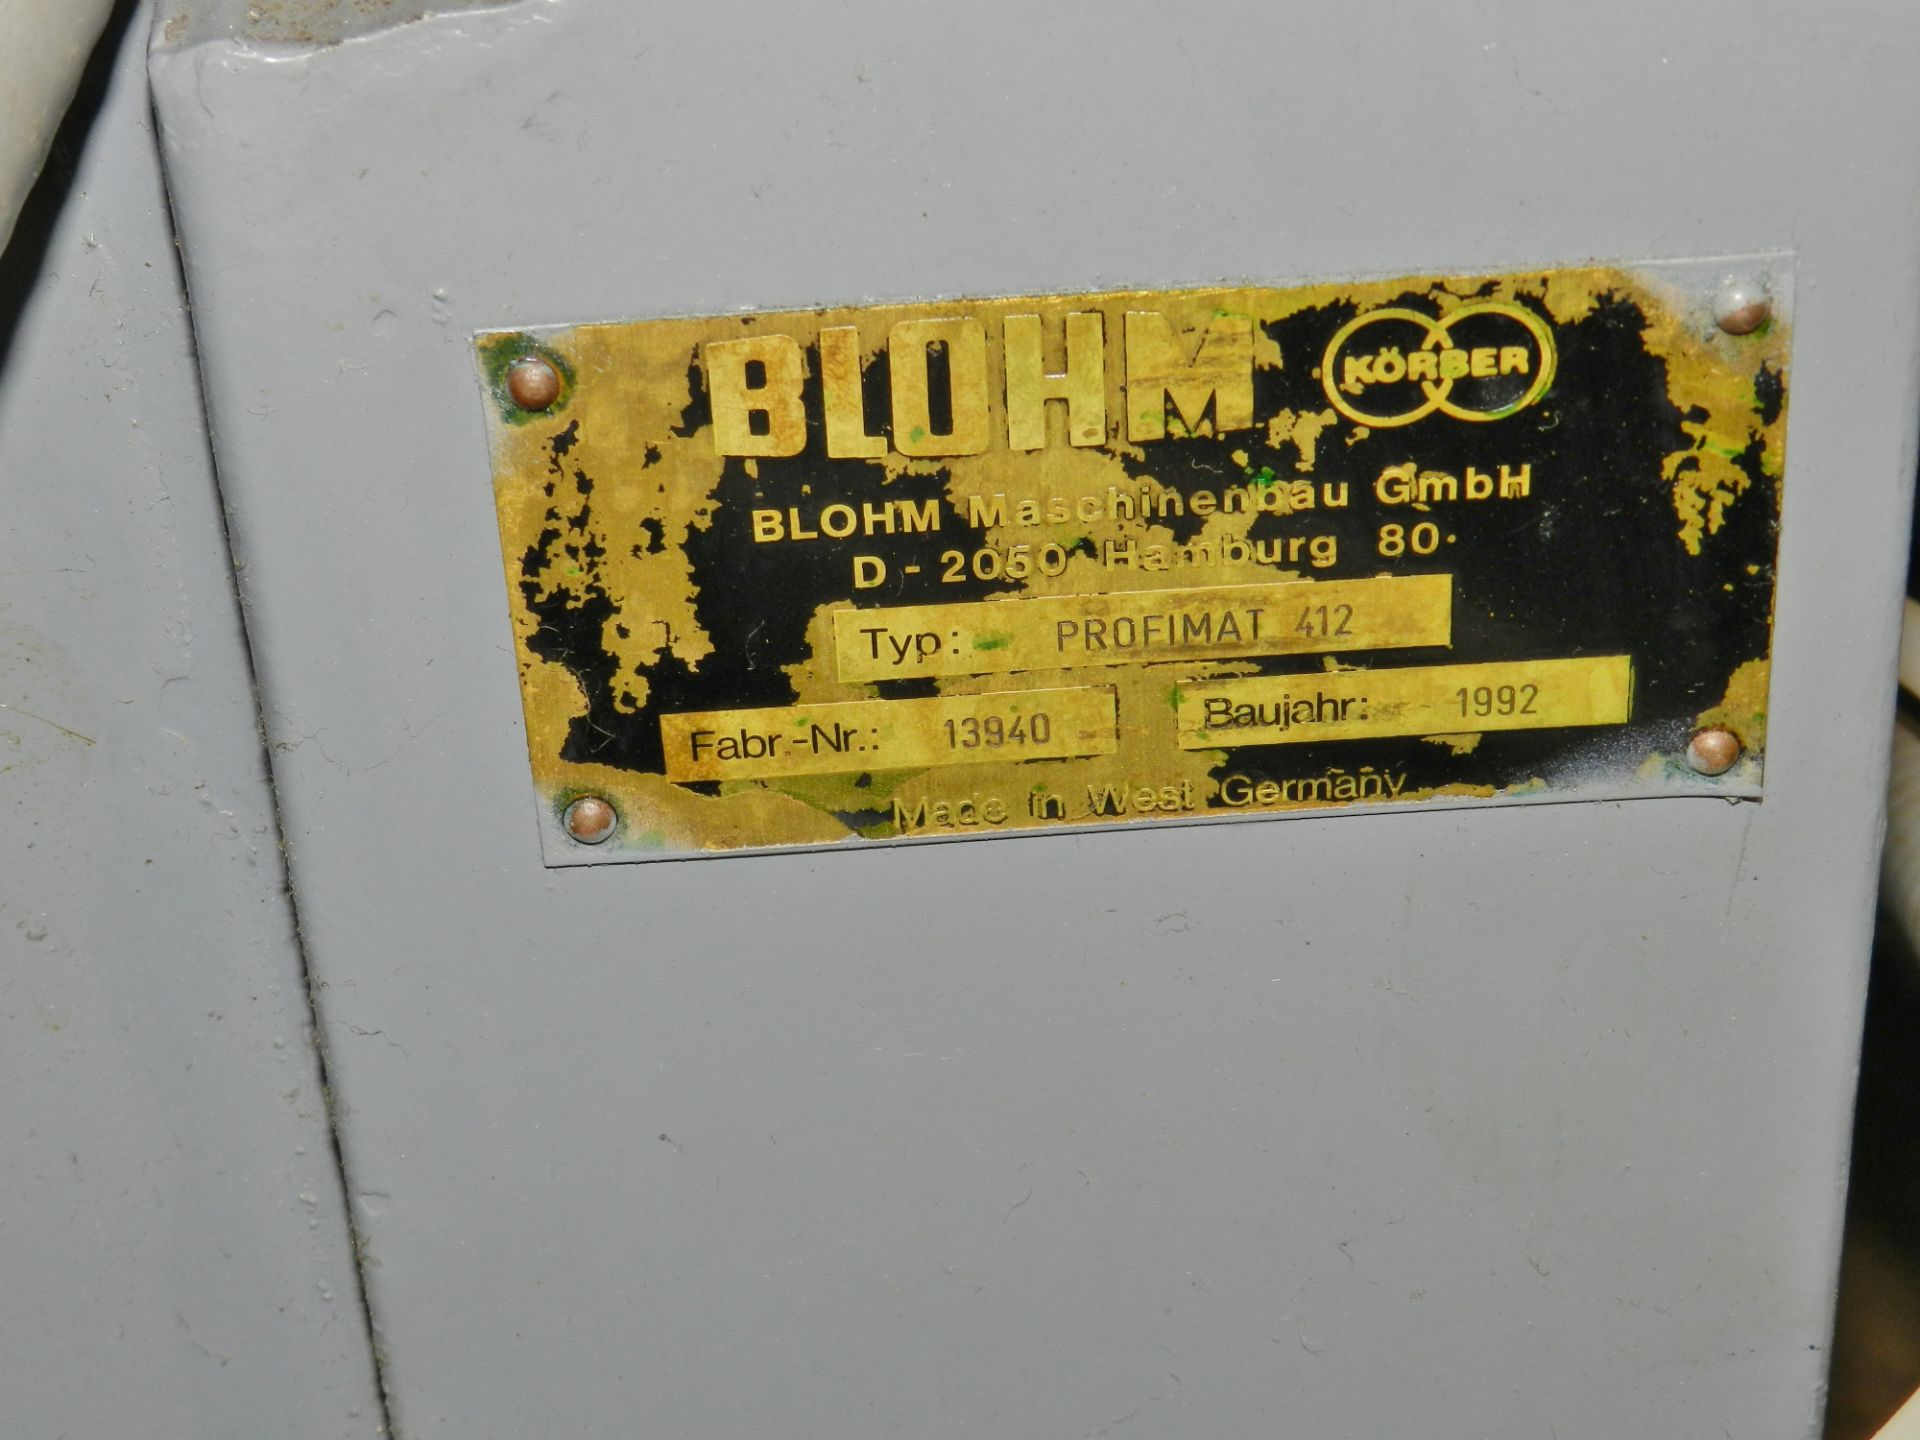 Lot 34 - Blohm Profimat 412 Creep Feed CNC Grinder